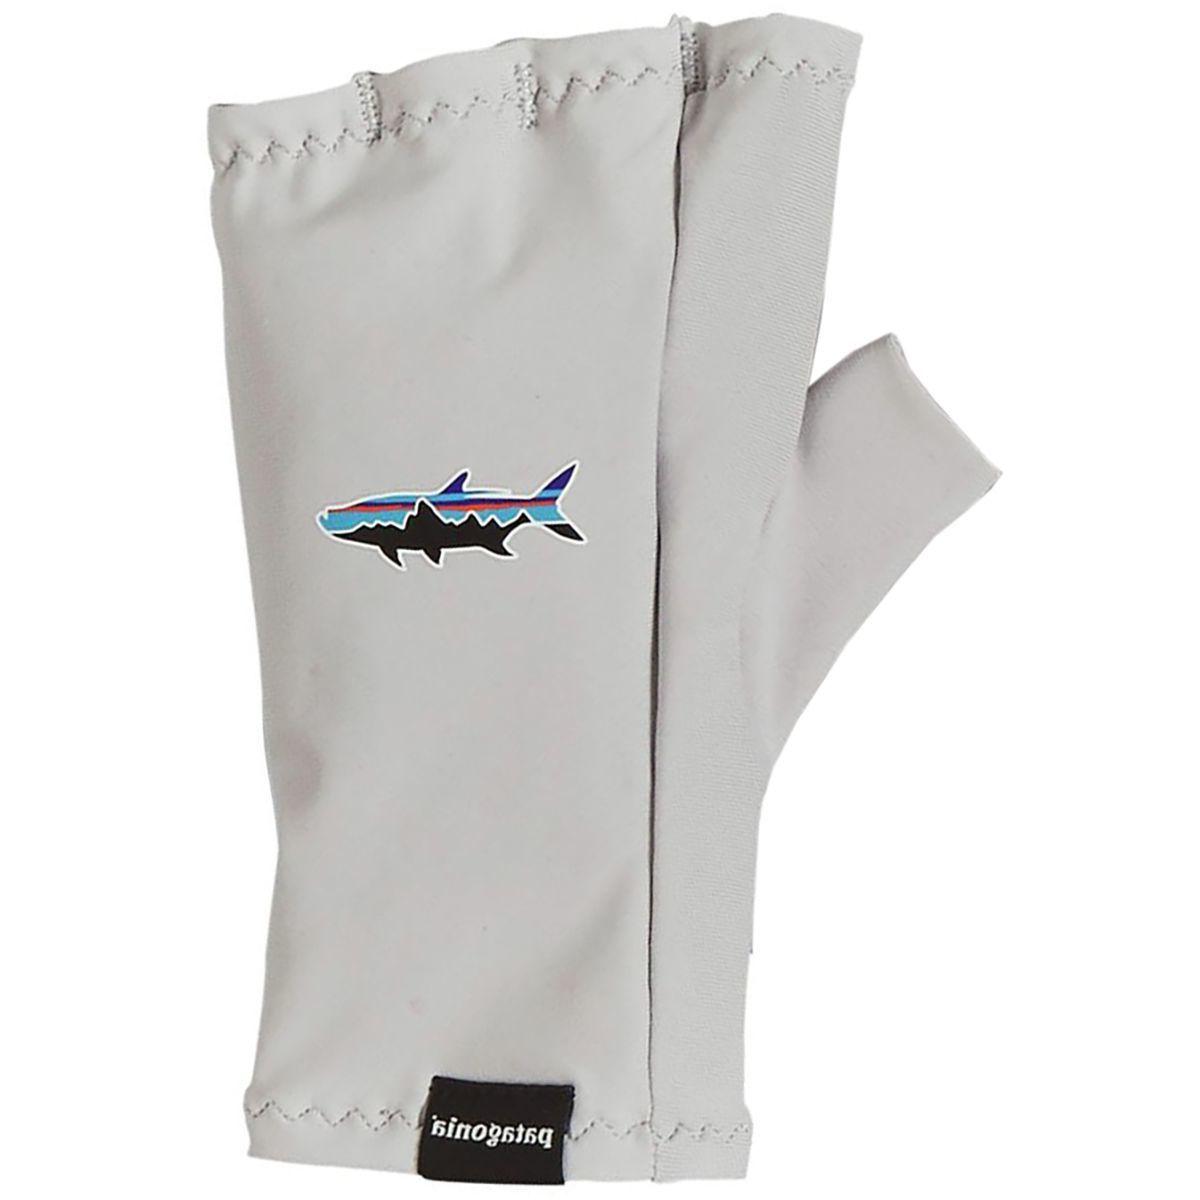 Patagonia Sun Glove - Women's